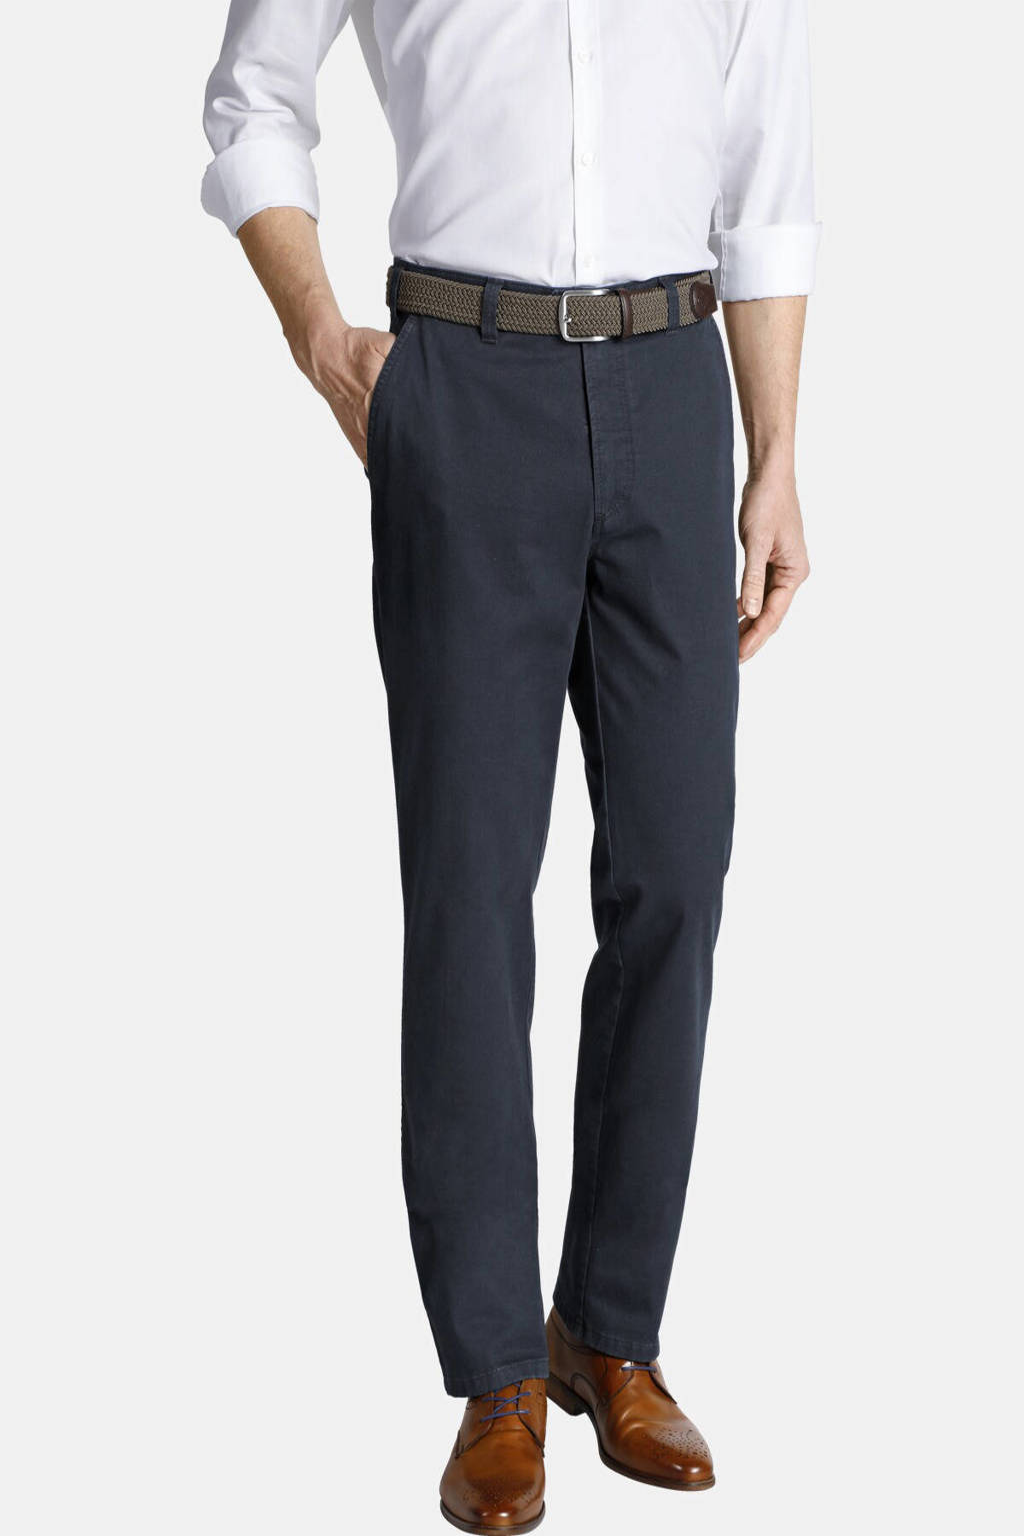 Charles Colby broek AURELIUS Plus Size donkerblauw, Donkerblauw